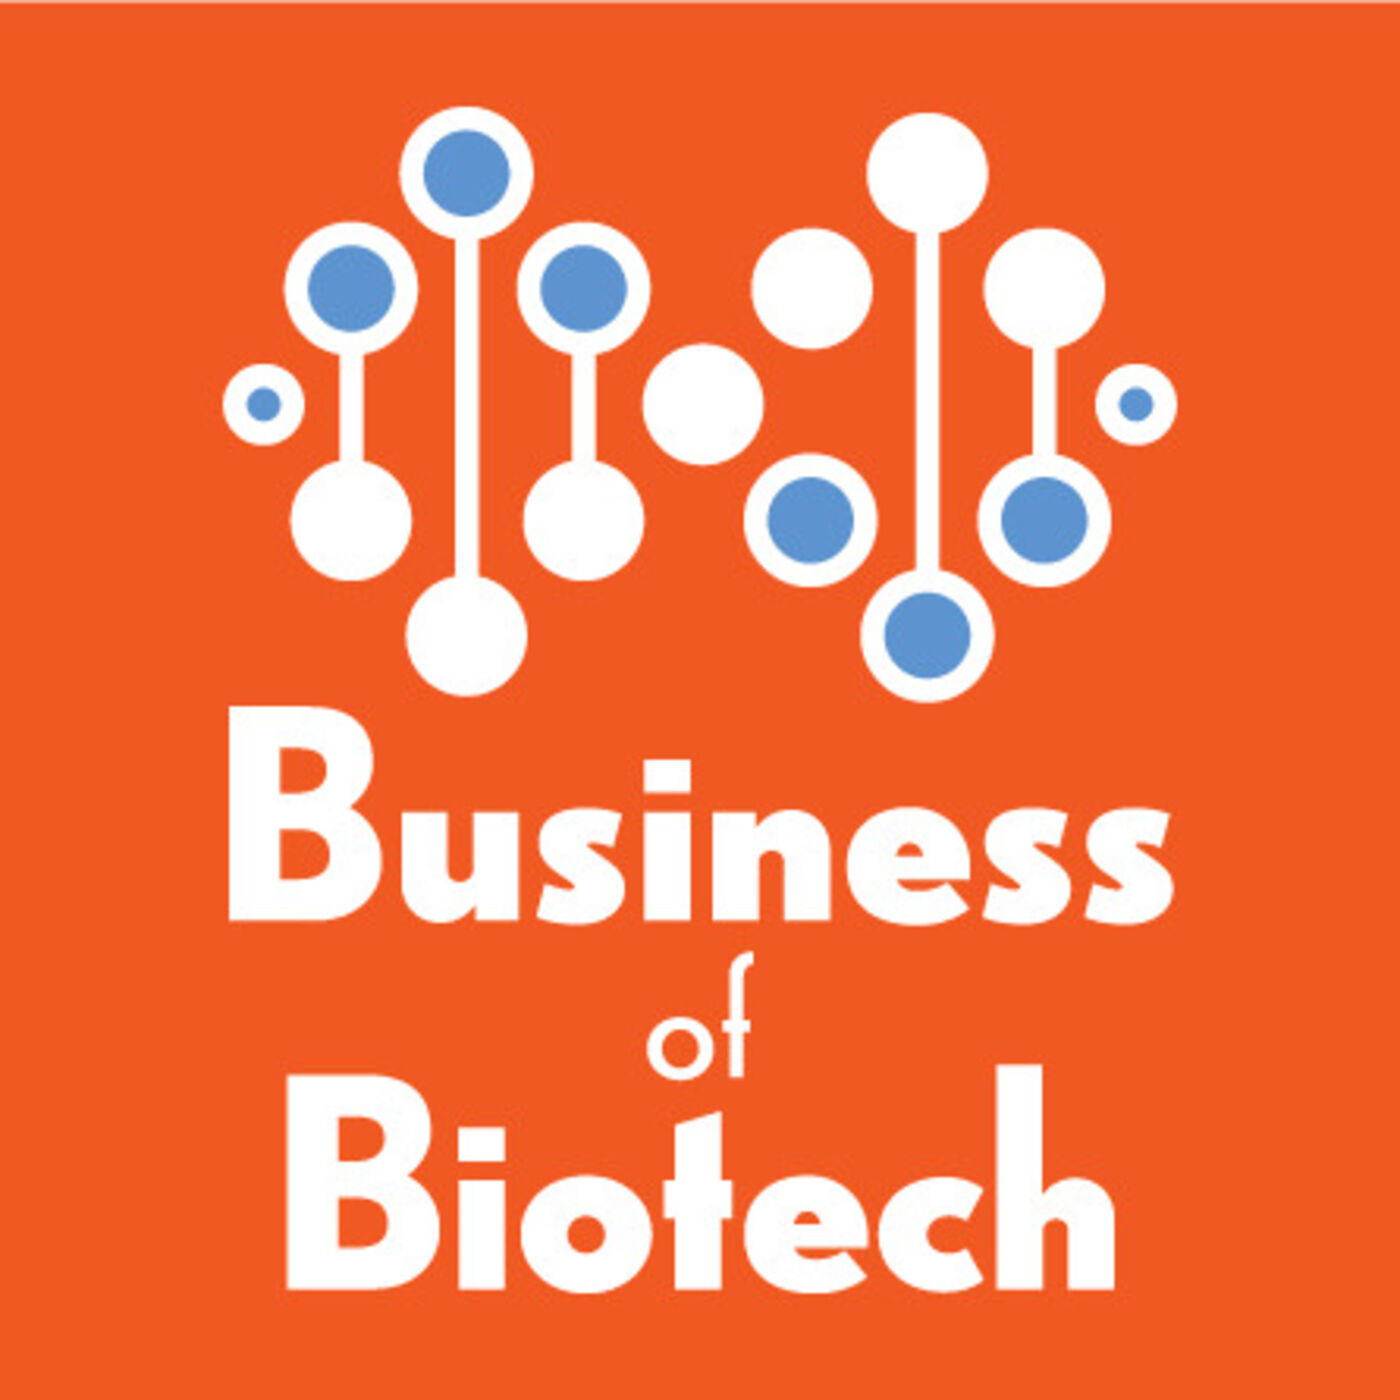 Business Of Biotech